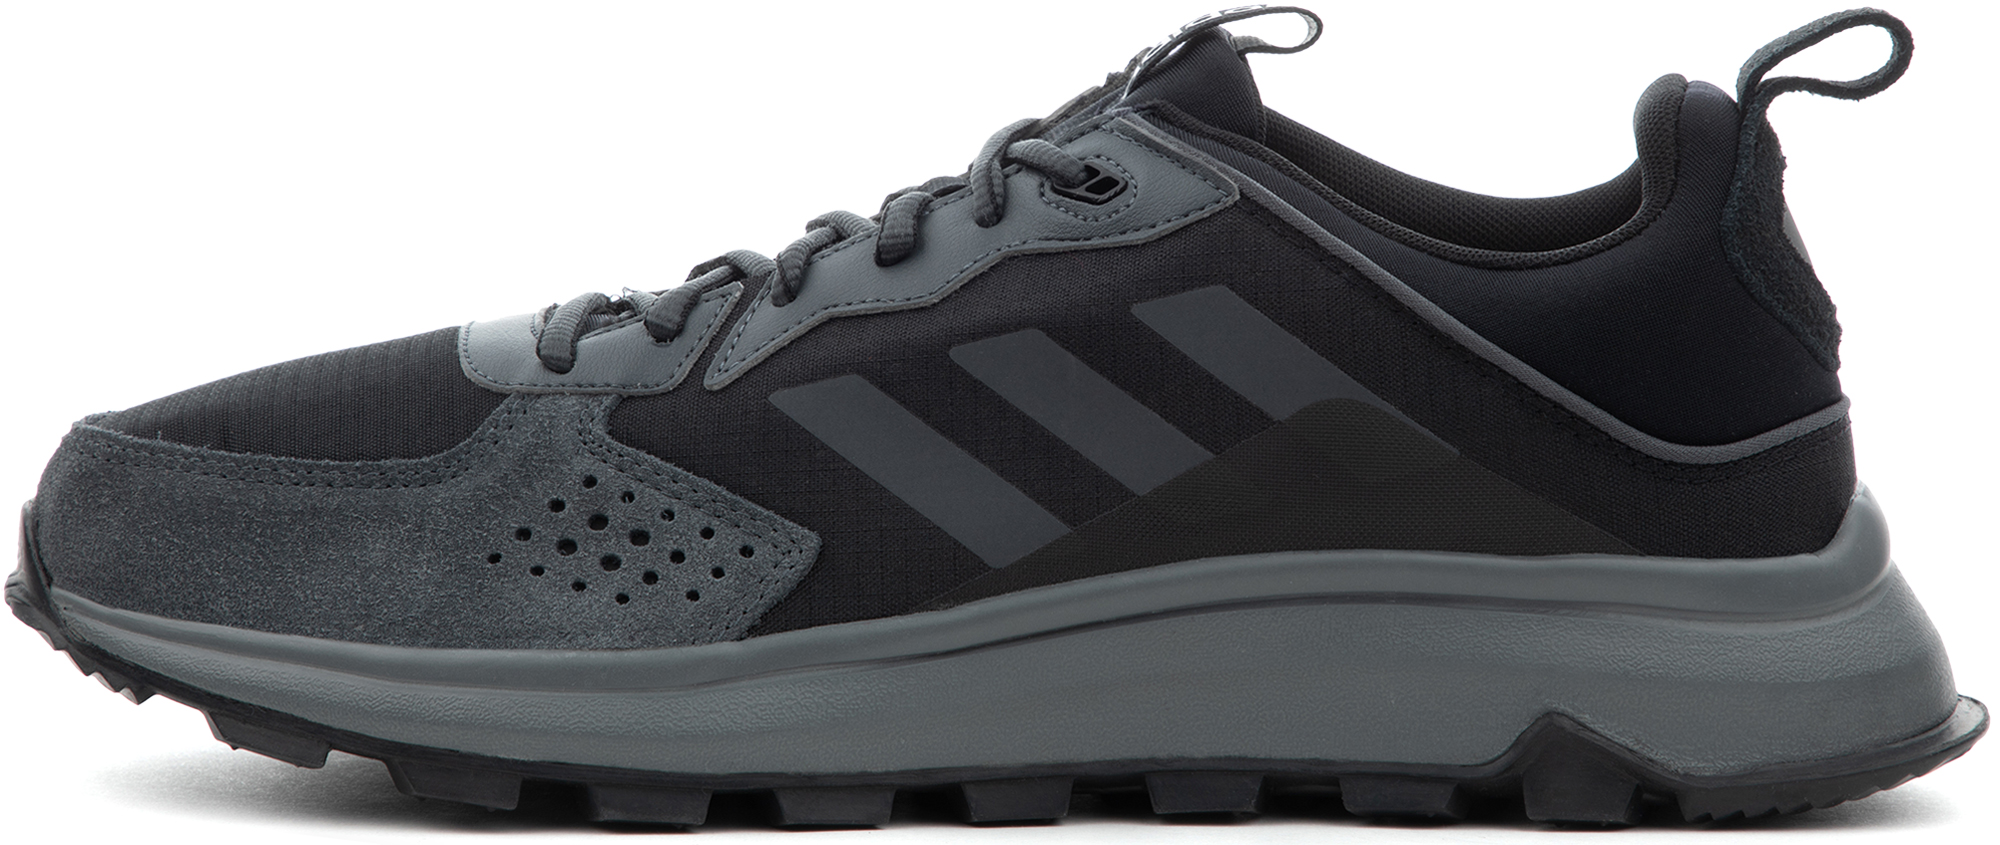 Adidas Кроссовки мужские Adidas Response, размер 46 цена